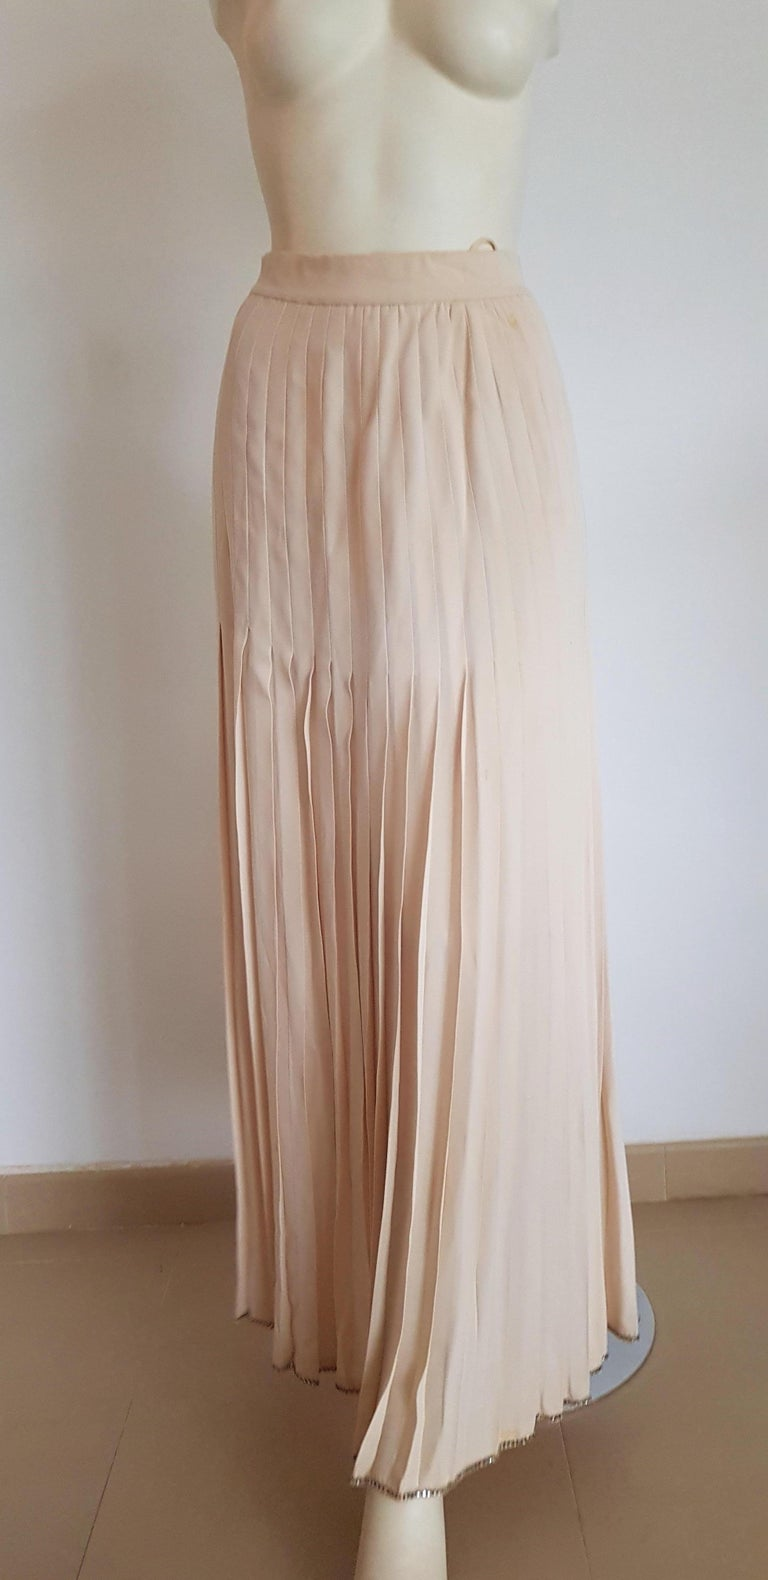 VALENTINO Haute Couture Top Skirt Swarovski Diamonds Waistband Silk Dress-Unworn For Sale 4